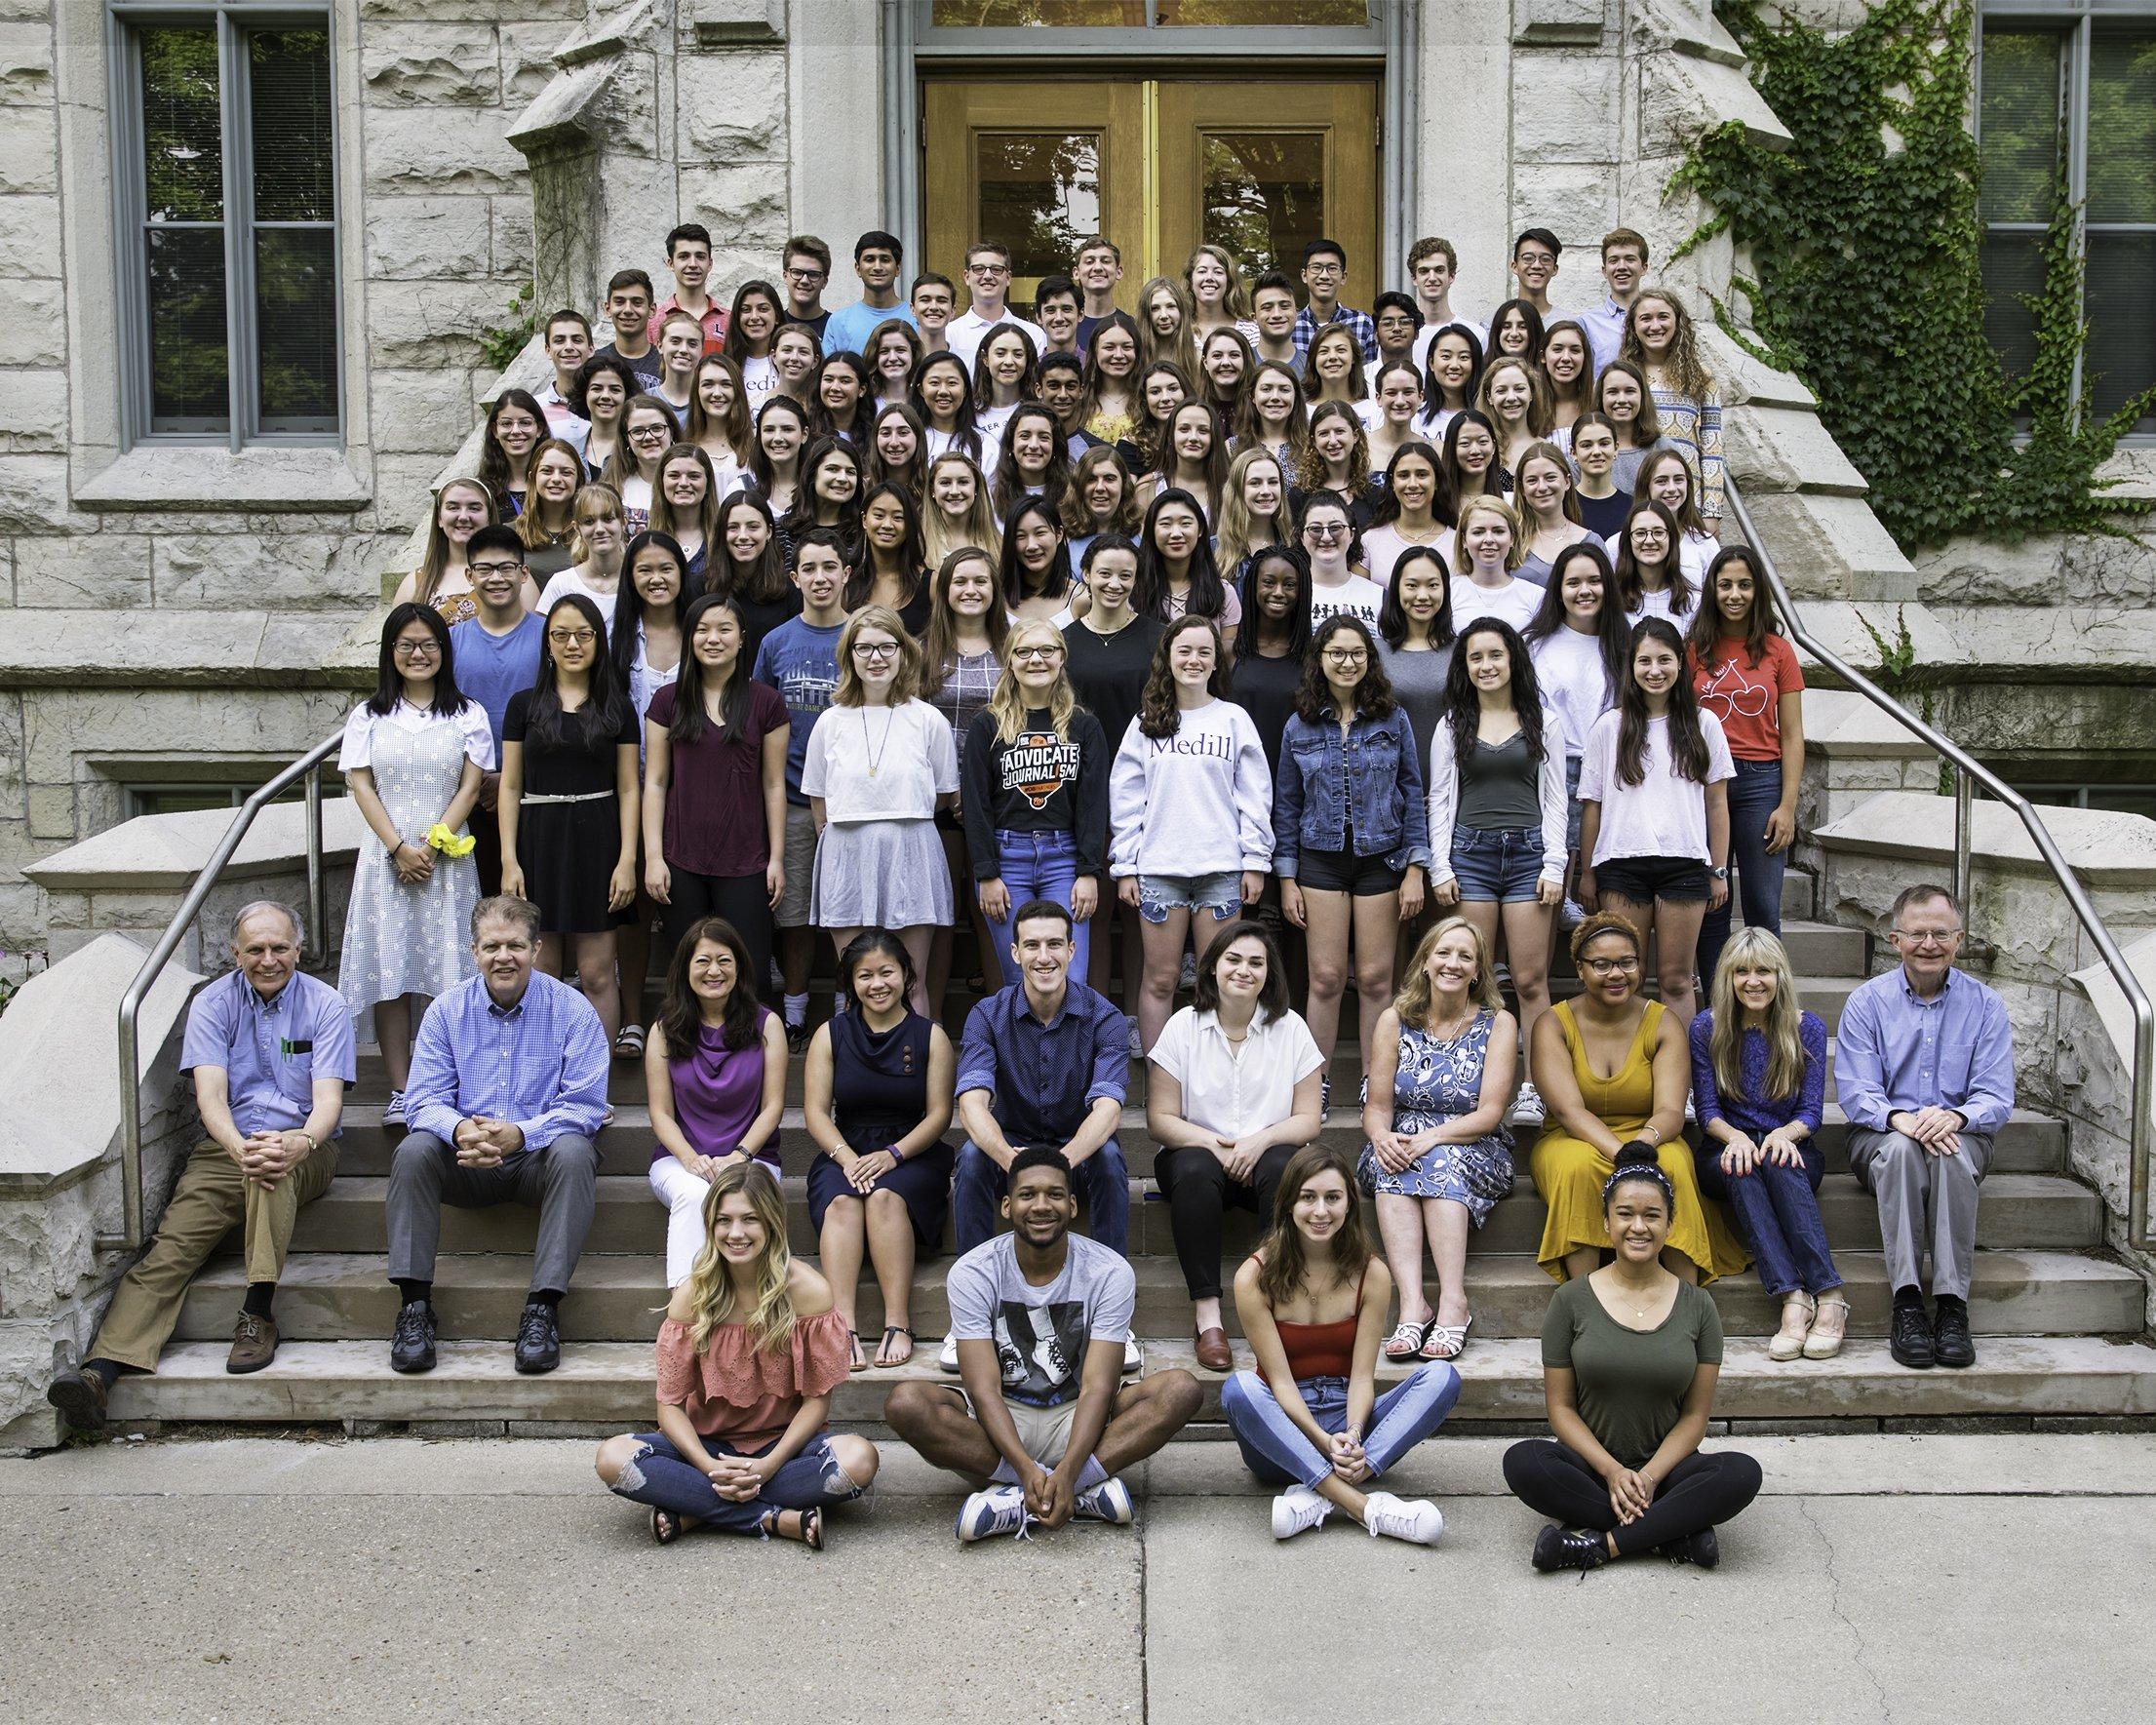 Medill Cherubs - Medill-Northwestern Journalism Institute - summer & extracurricular activities for college